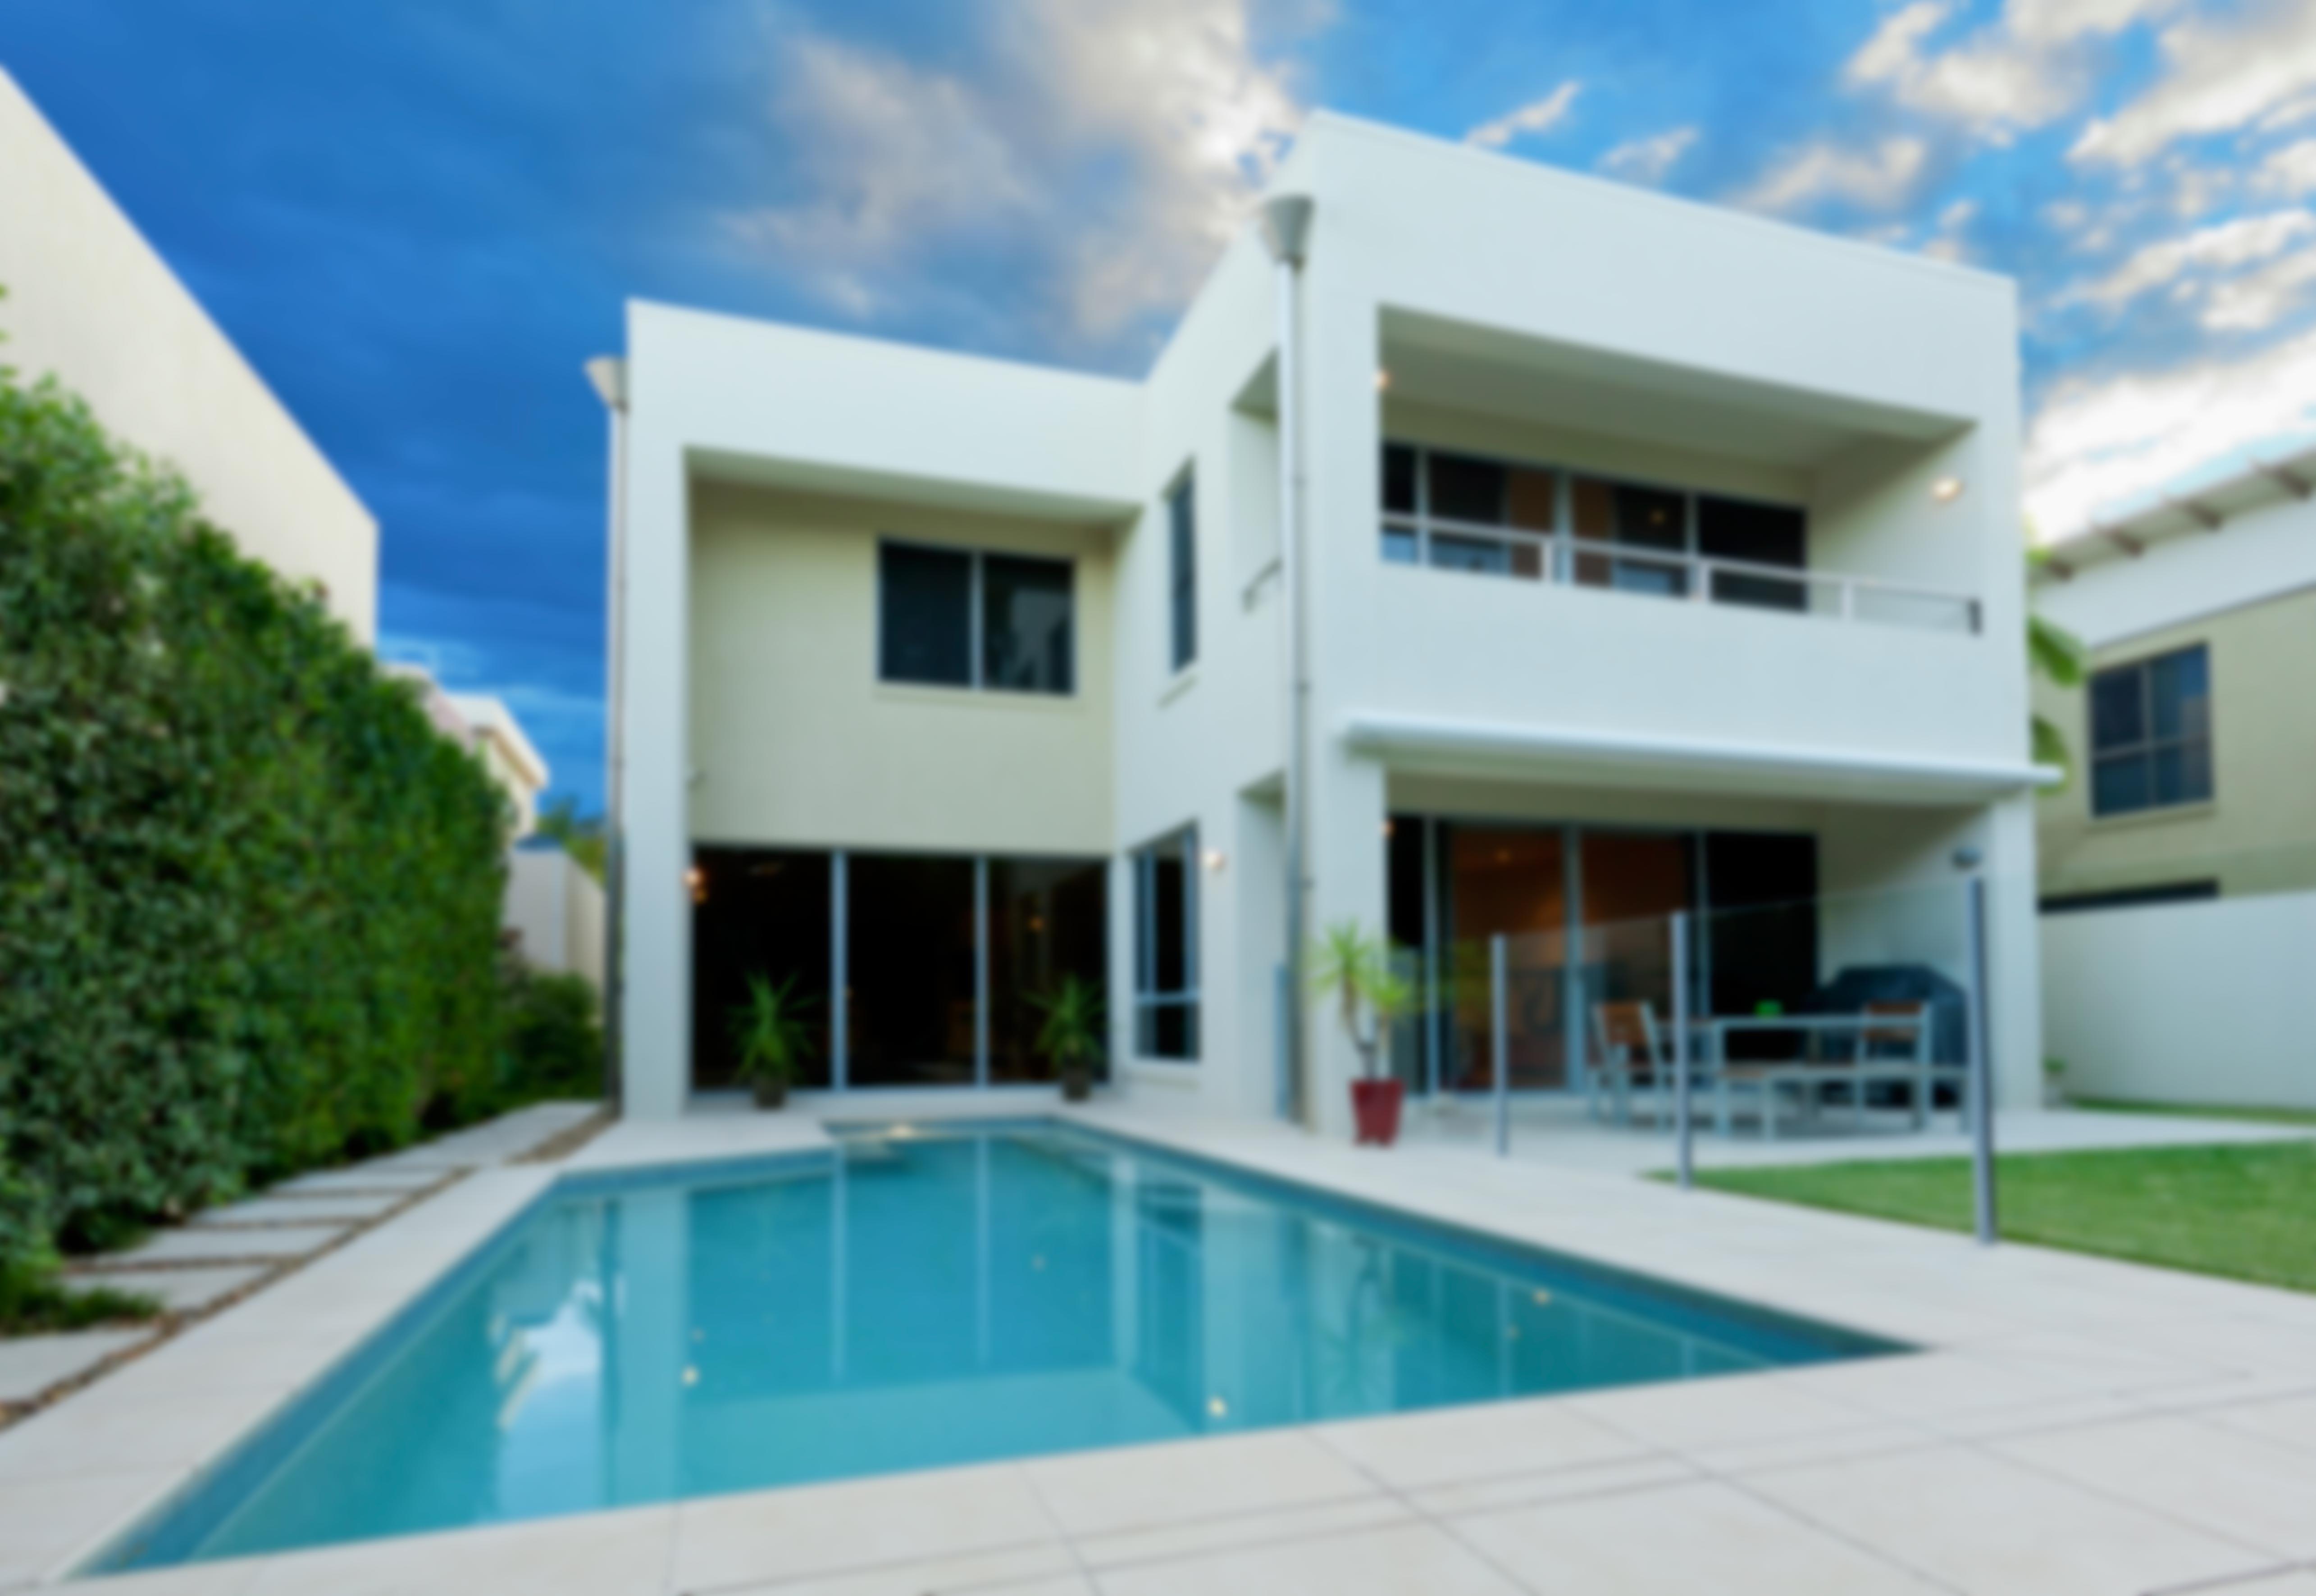 https://assets.boxdice.com.au/one-agency/attachments/528/66c/property_rent_banner2.jpg?e32942be1b574d8296a20b32fe79466b